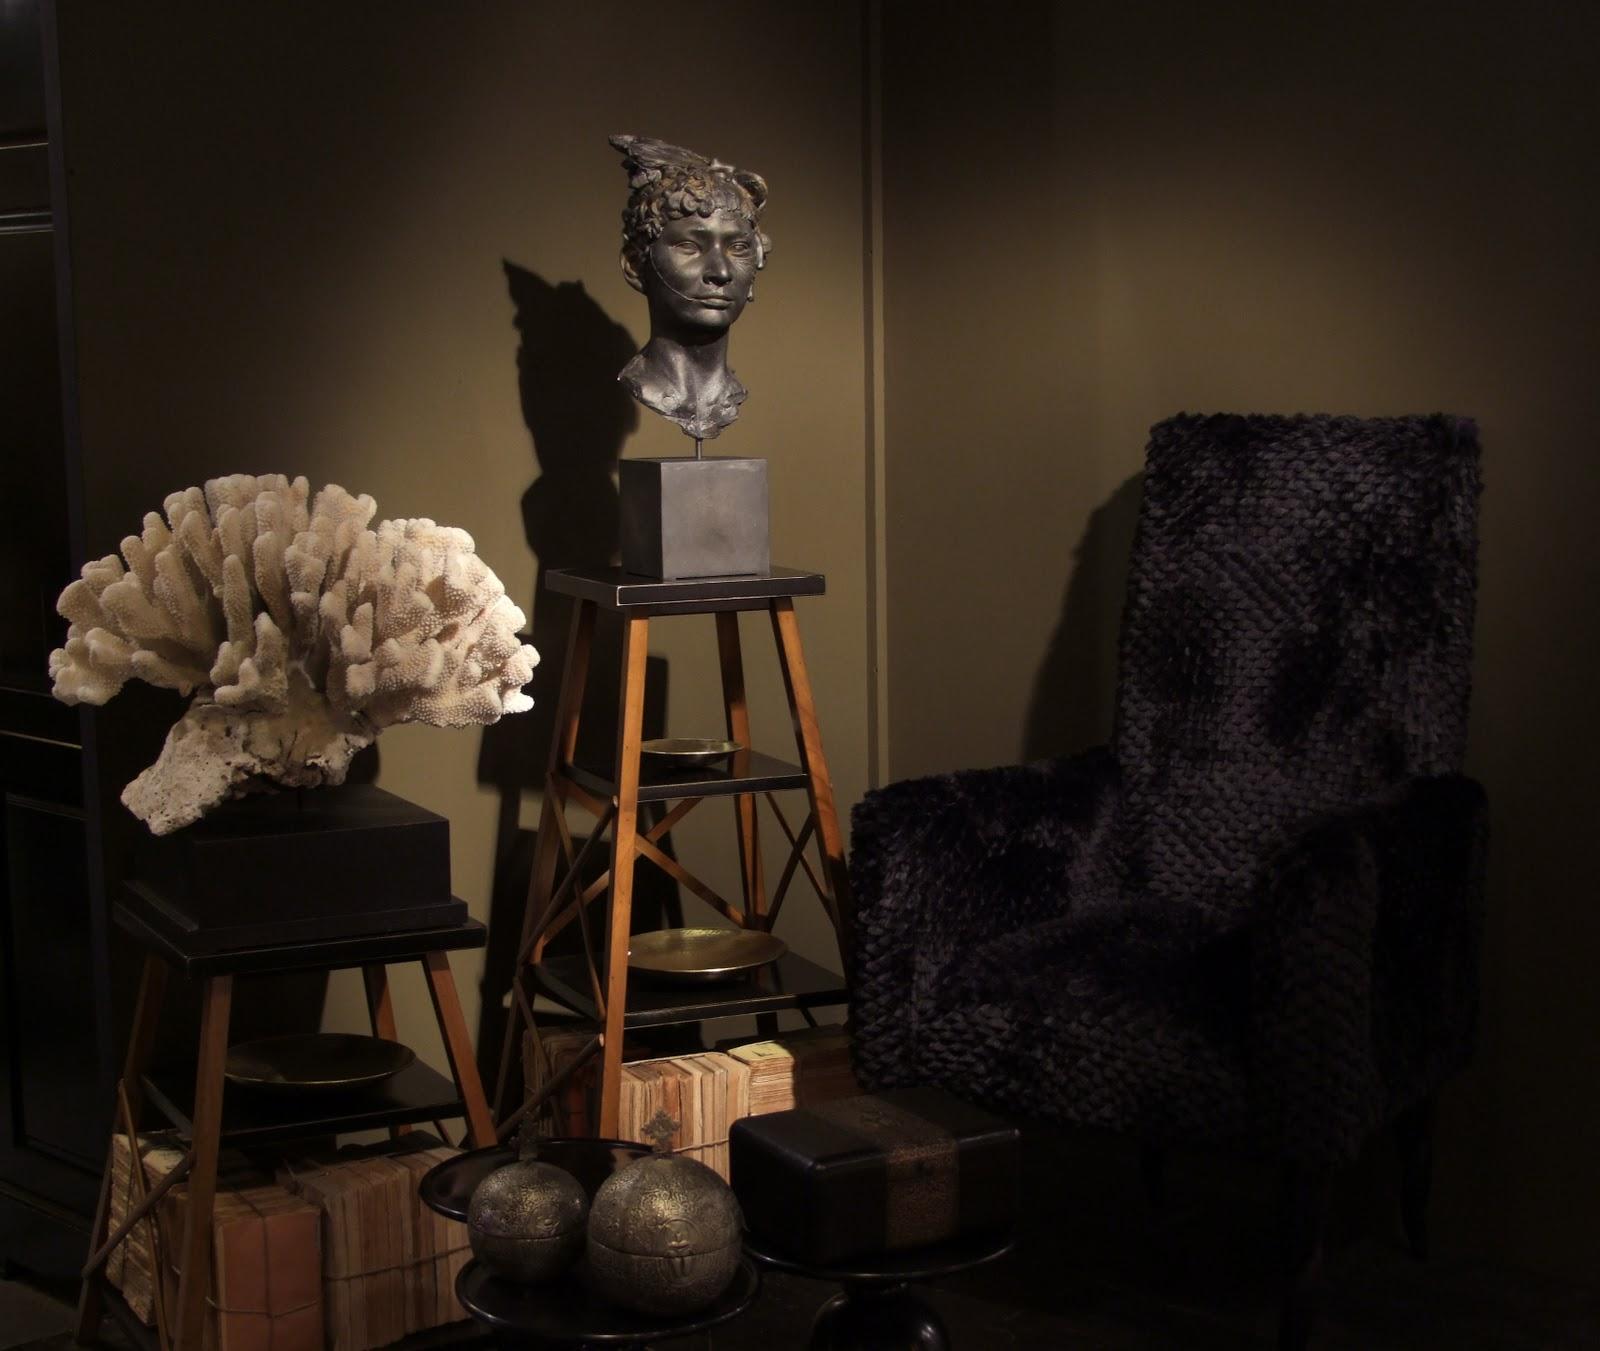 z design objet de curiosite vibrate. Black Bedroom Furniture Sets. Home Design Ideas